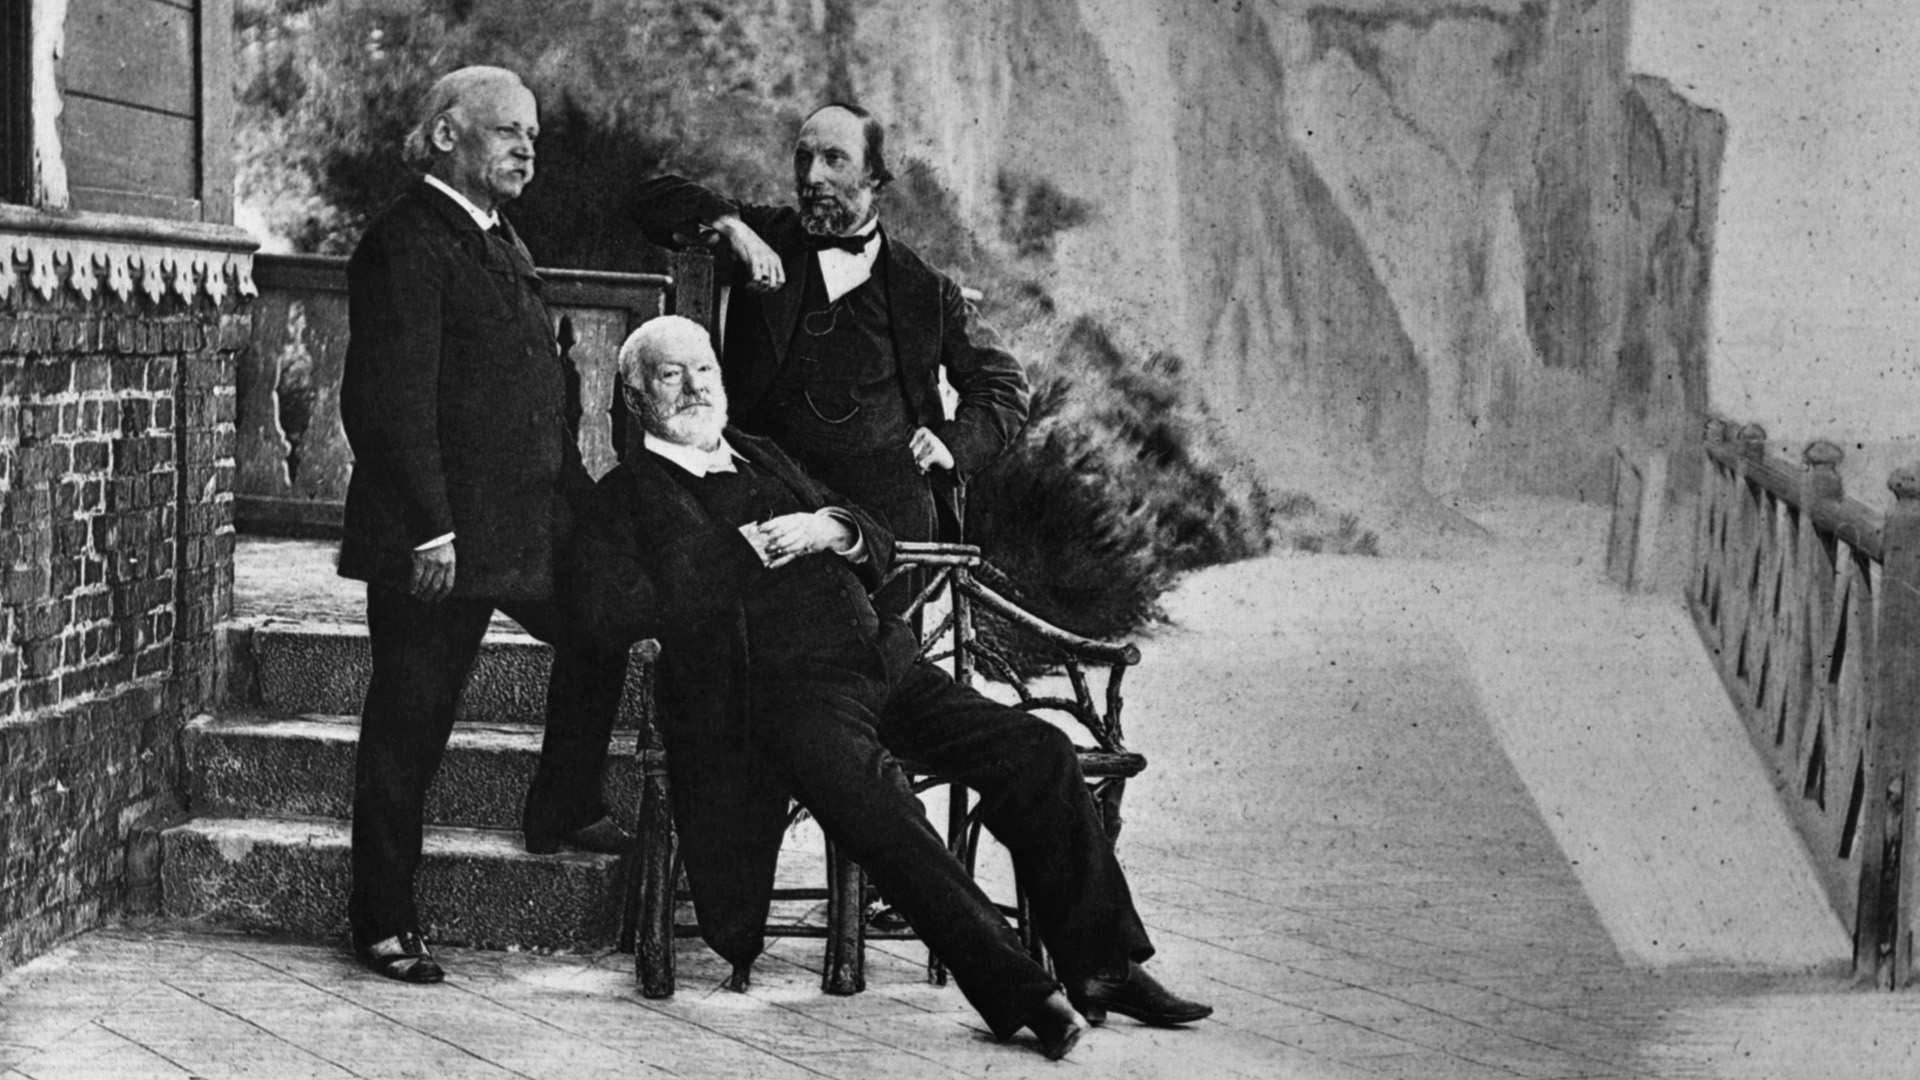 dr. Gruby Victor Hugot is meggyógyította